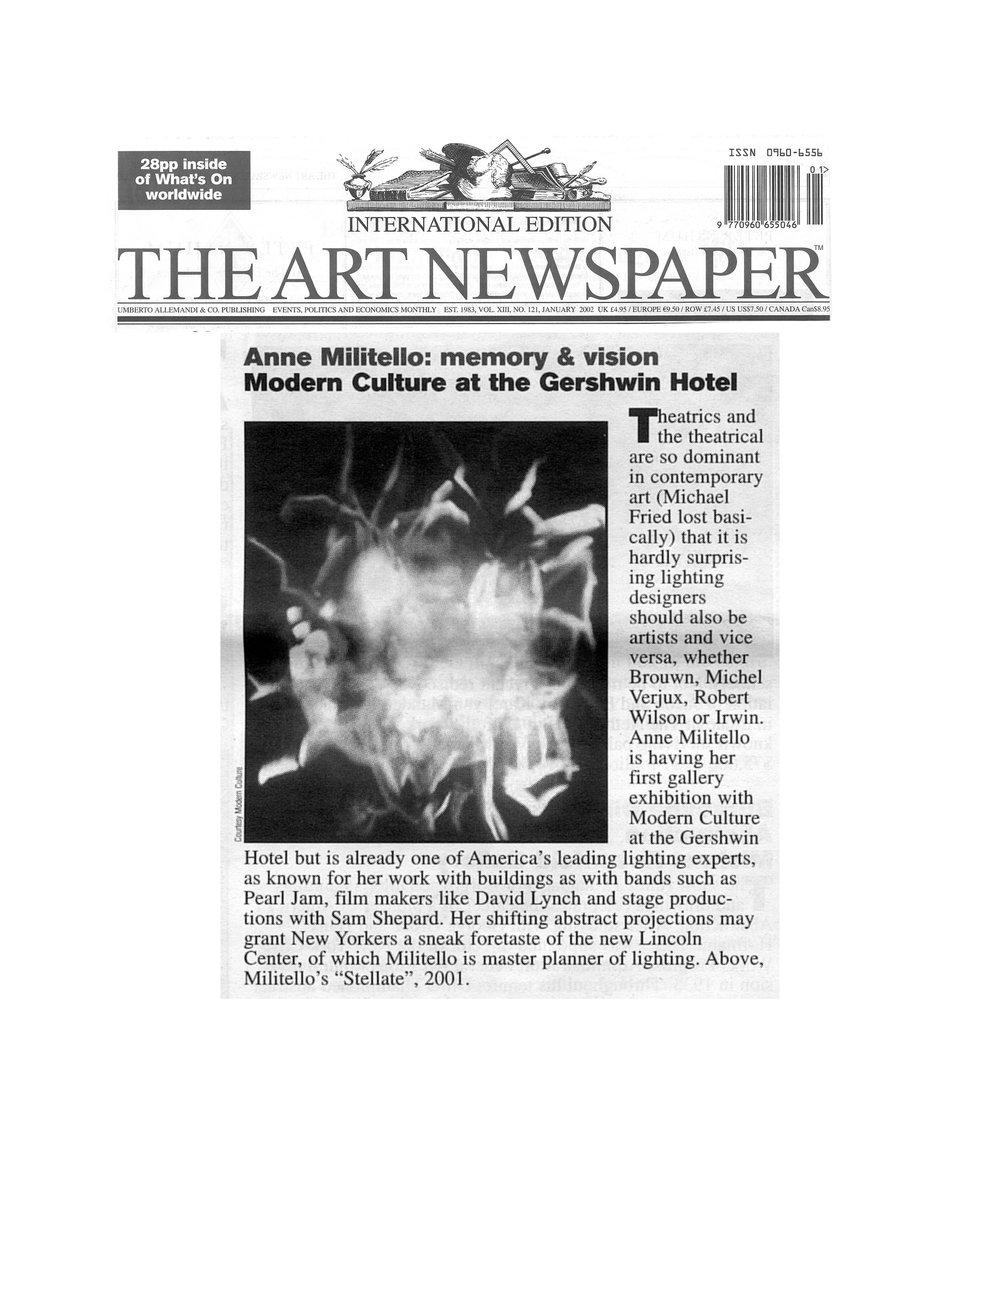 THE ART NEWSPAPER | 2002